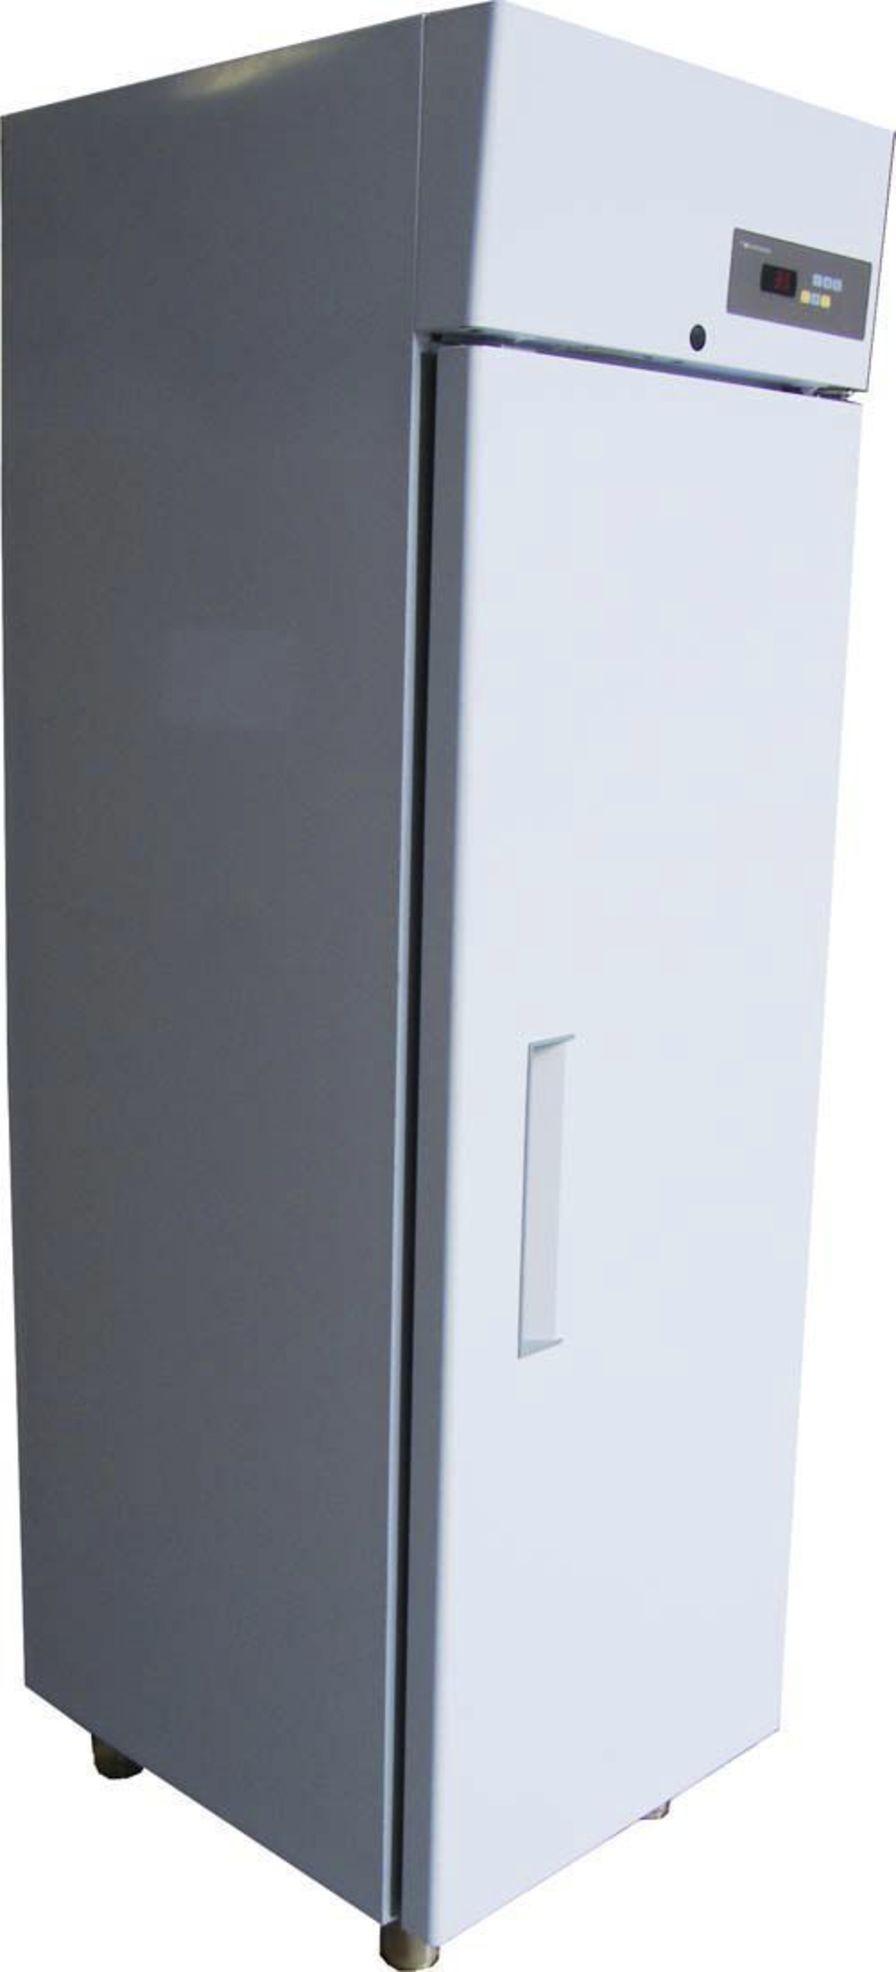 Laboratory freezer / cabinet / 1-door LDF series IKS International